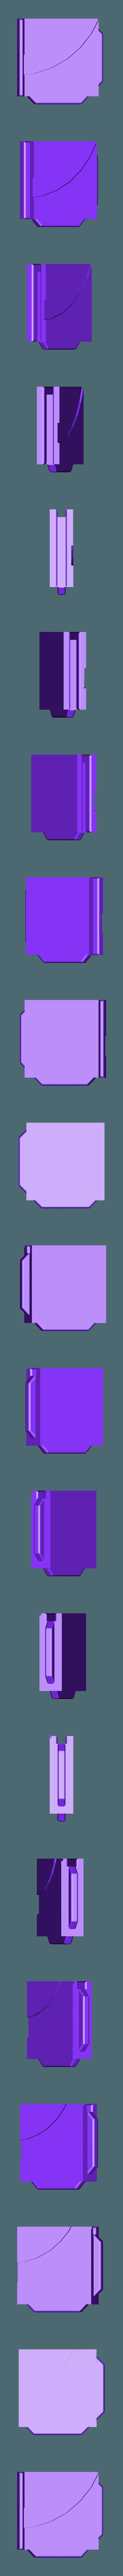 Piece - Part 12.stl Download free STL file Taquin CULTS / Sliding Puzzle • 3D print model, Valelab3D